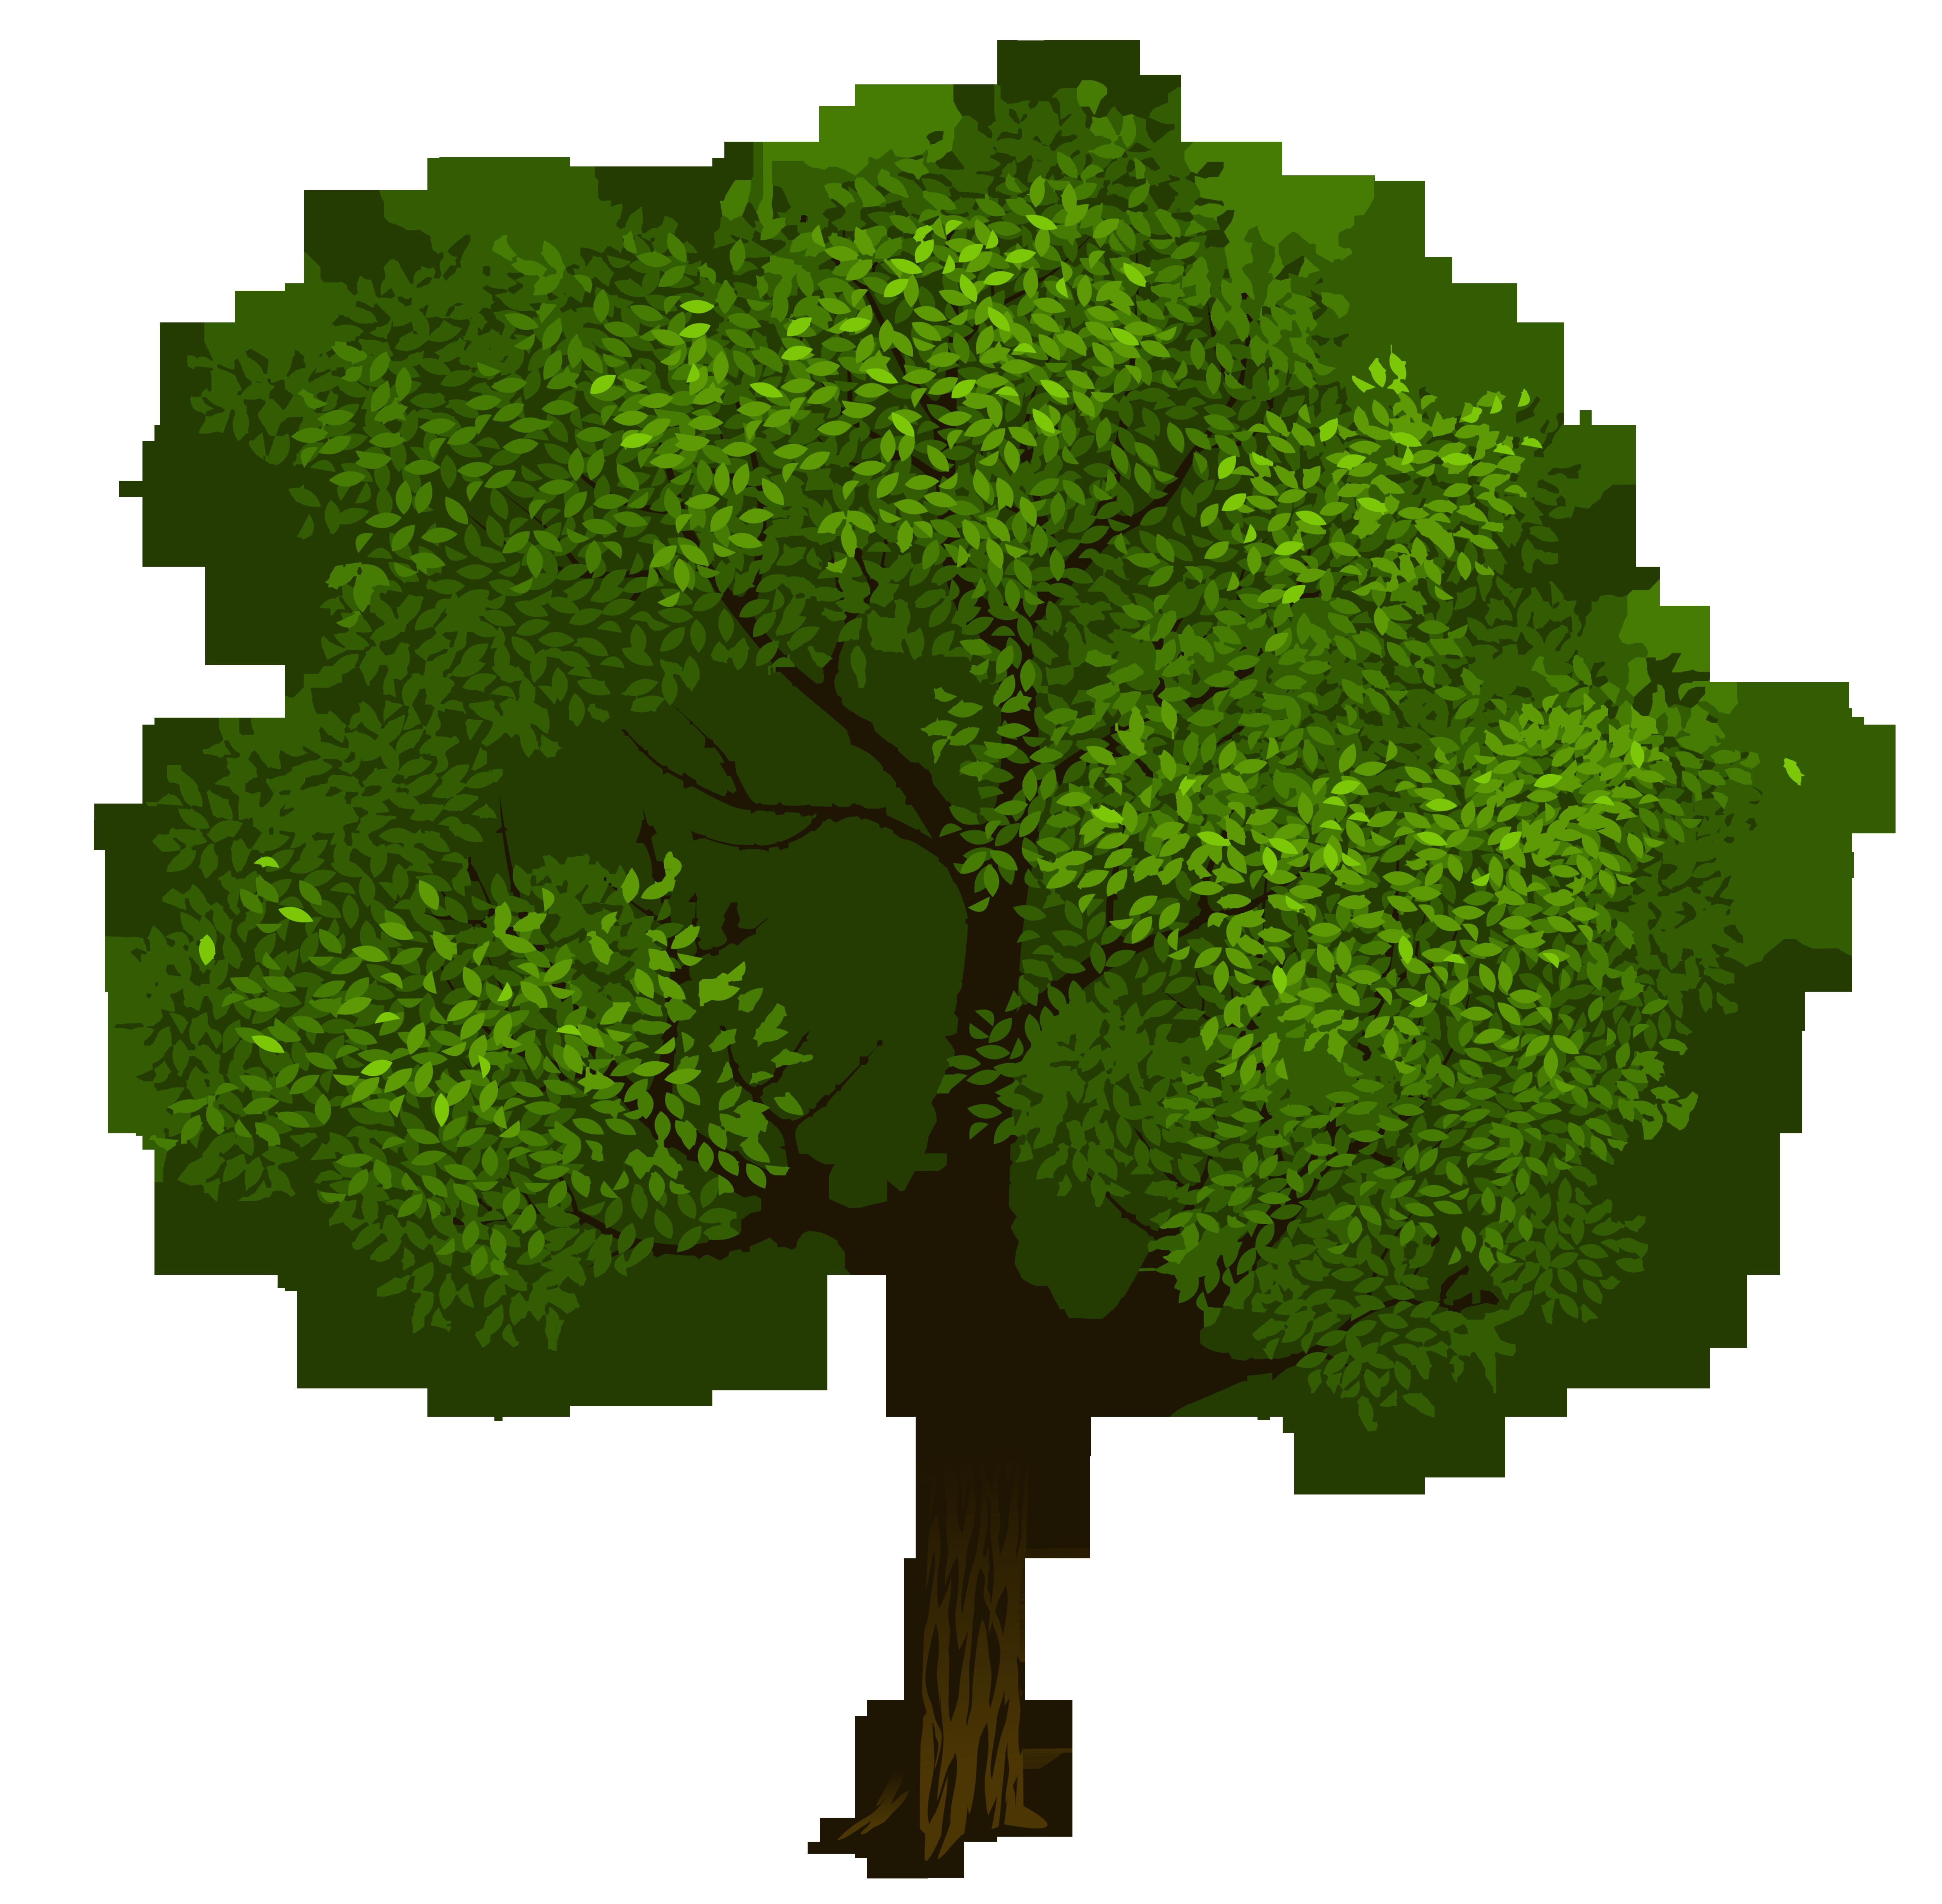 Transparent green tree.